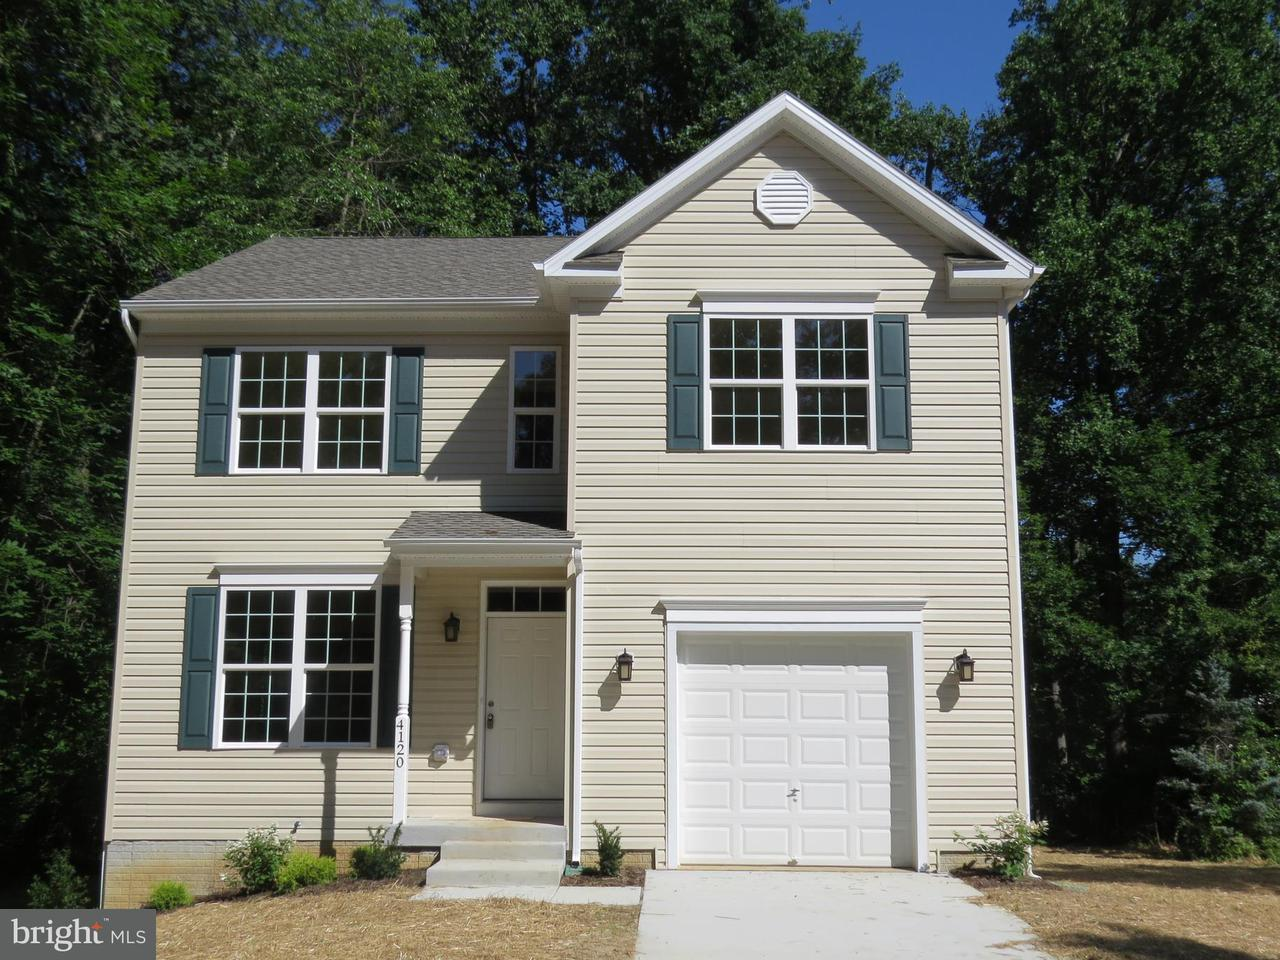 Single Family for Sale at 3601 Oak Ave Gwynn Oak, Maryland 21207 United States